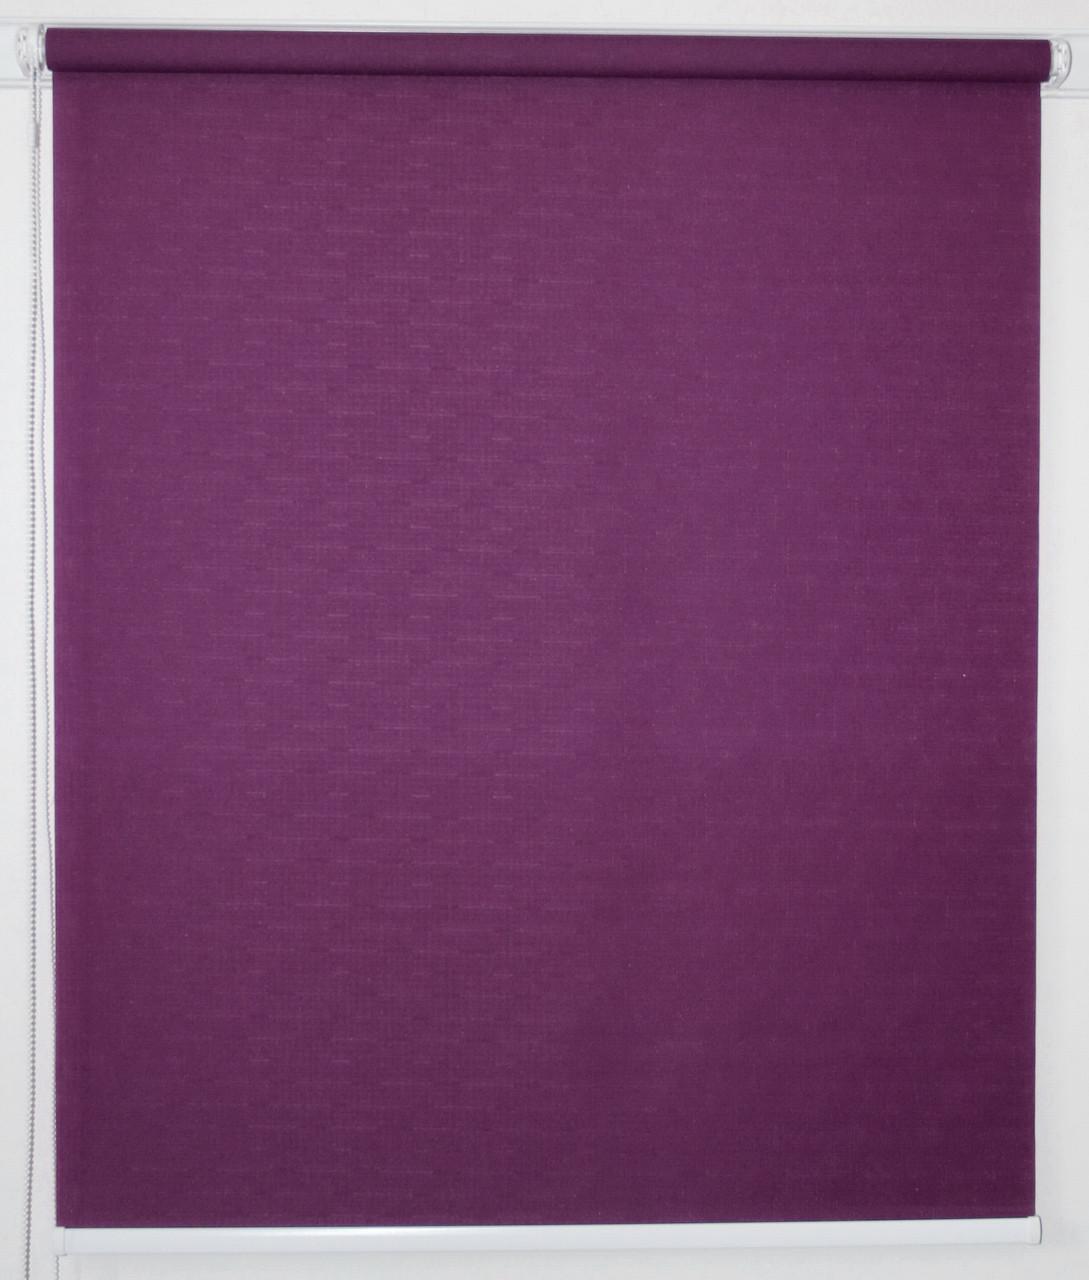 Рулонная штора 750*1500 Лён 613 Фиолетовый